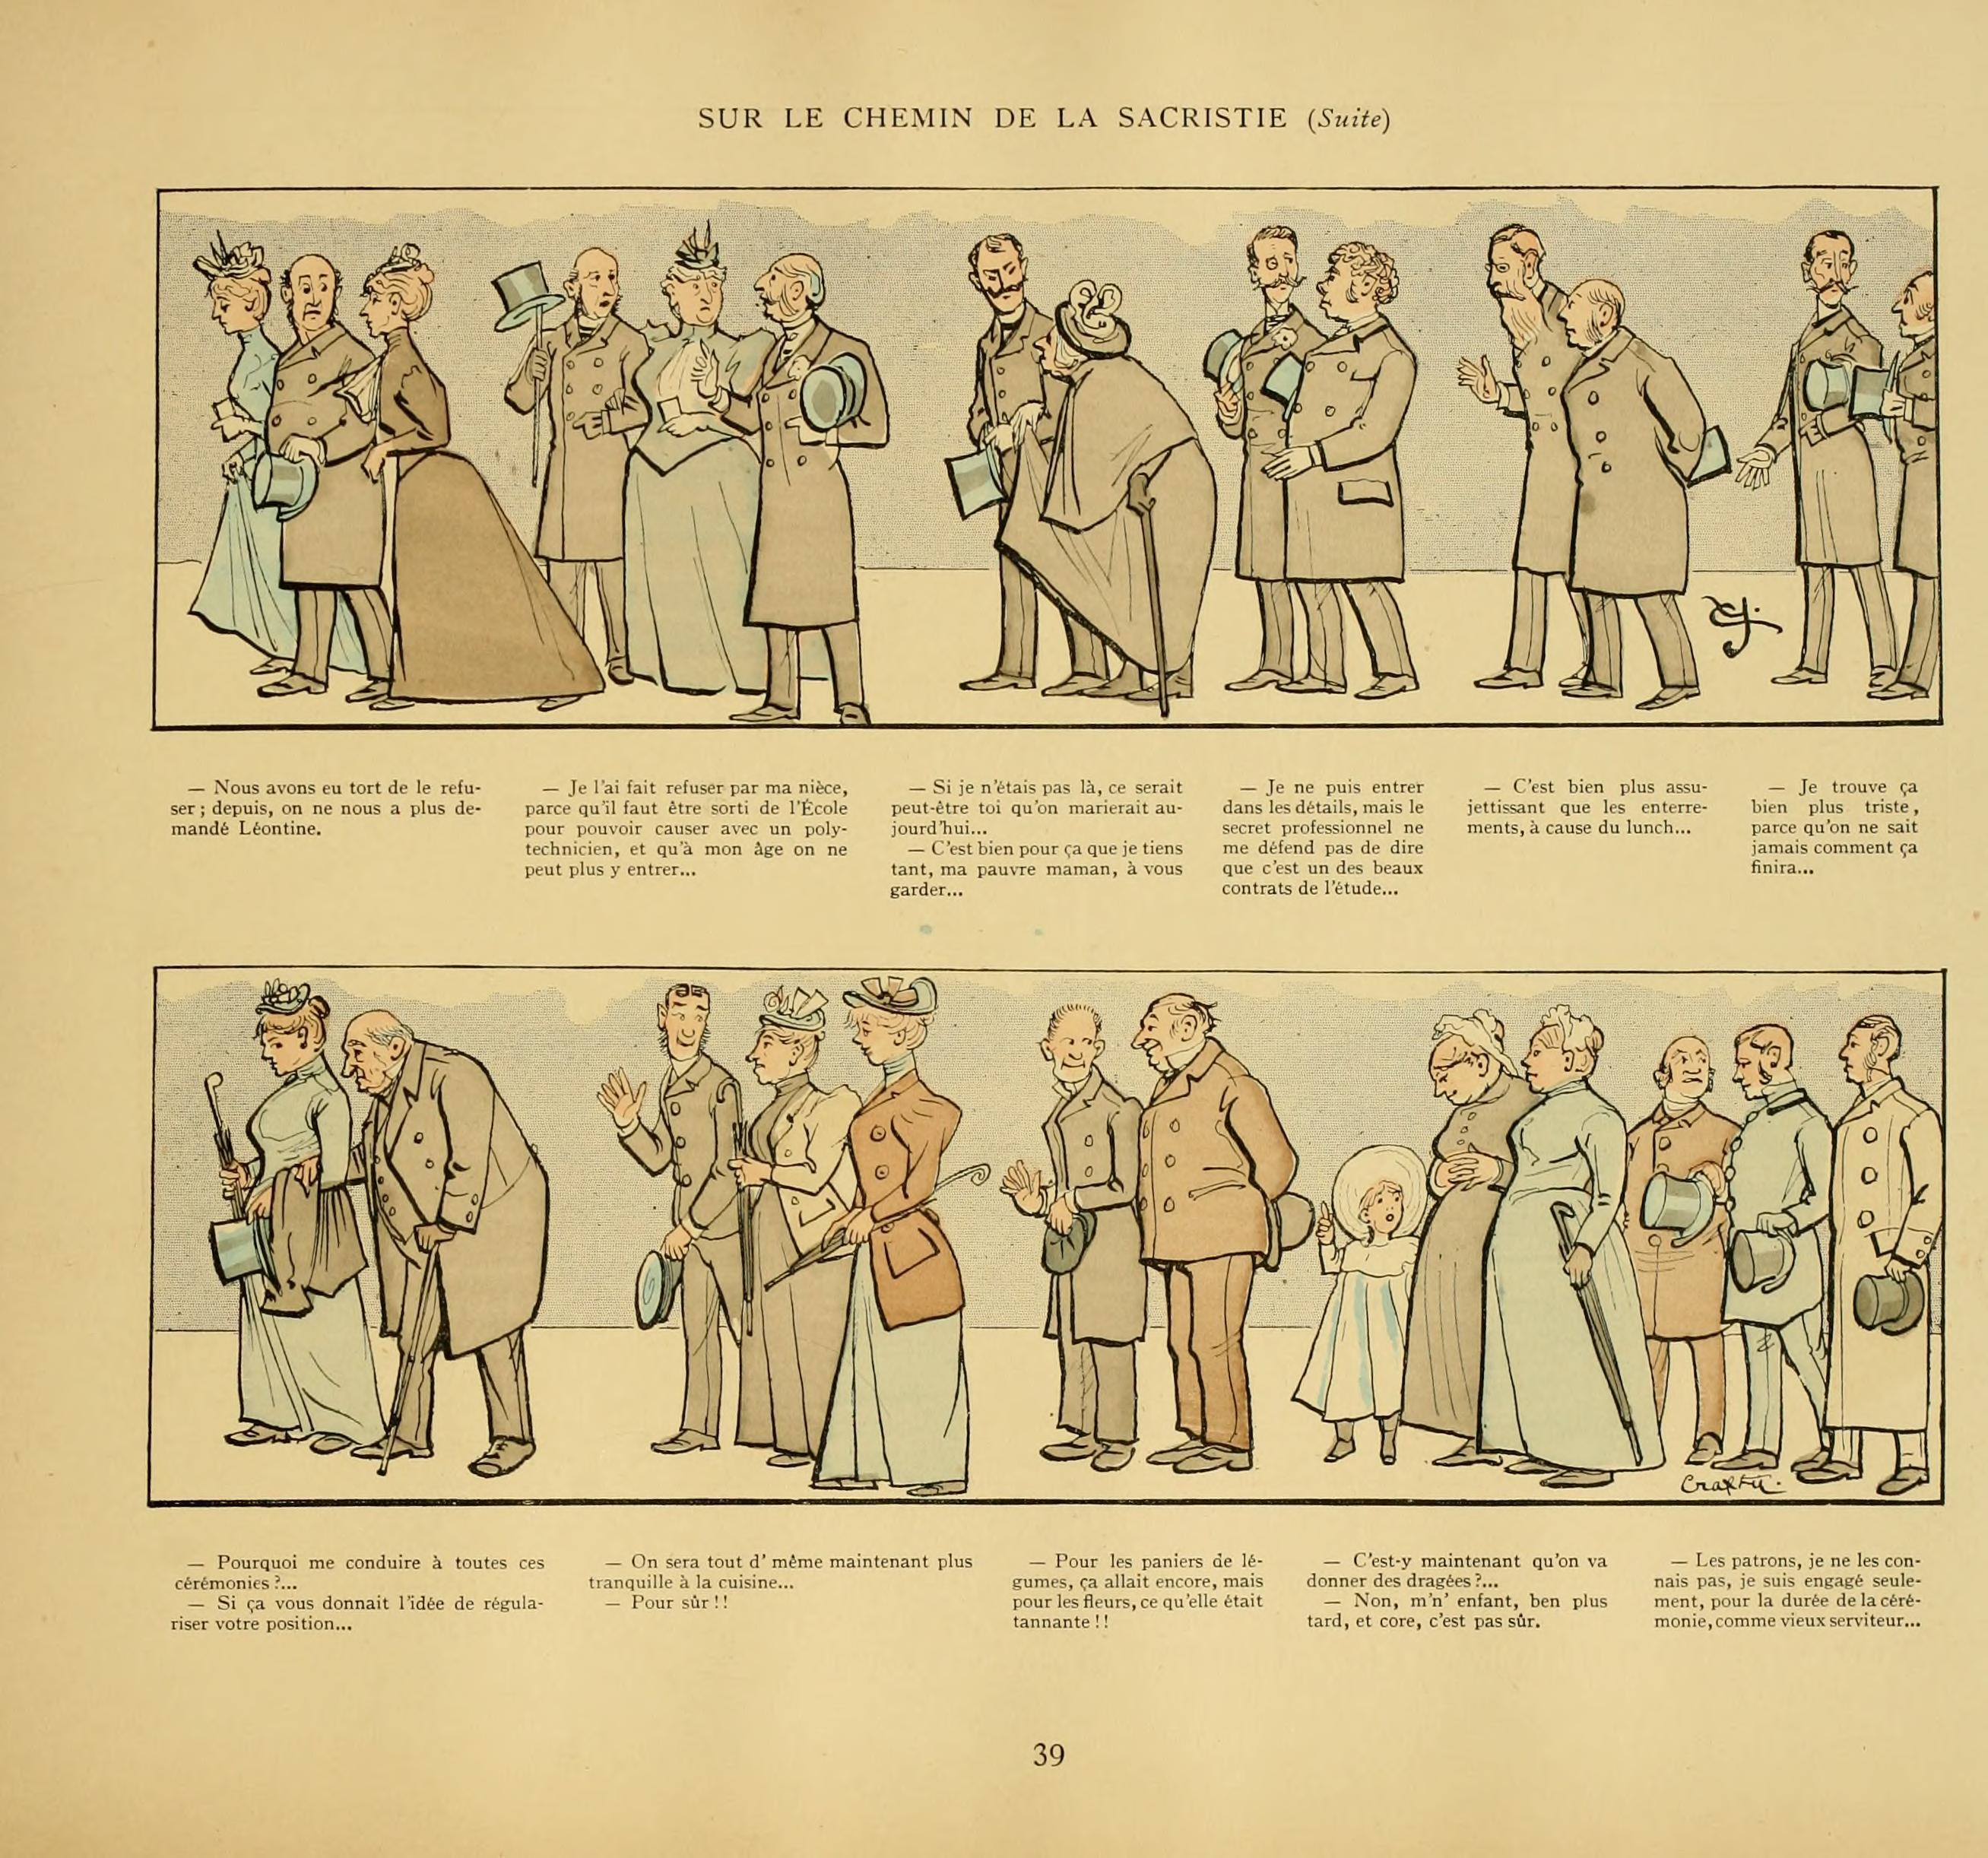 File:A travers Paris (Page 39) BHL25262255.jpg